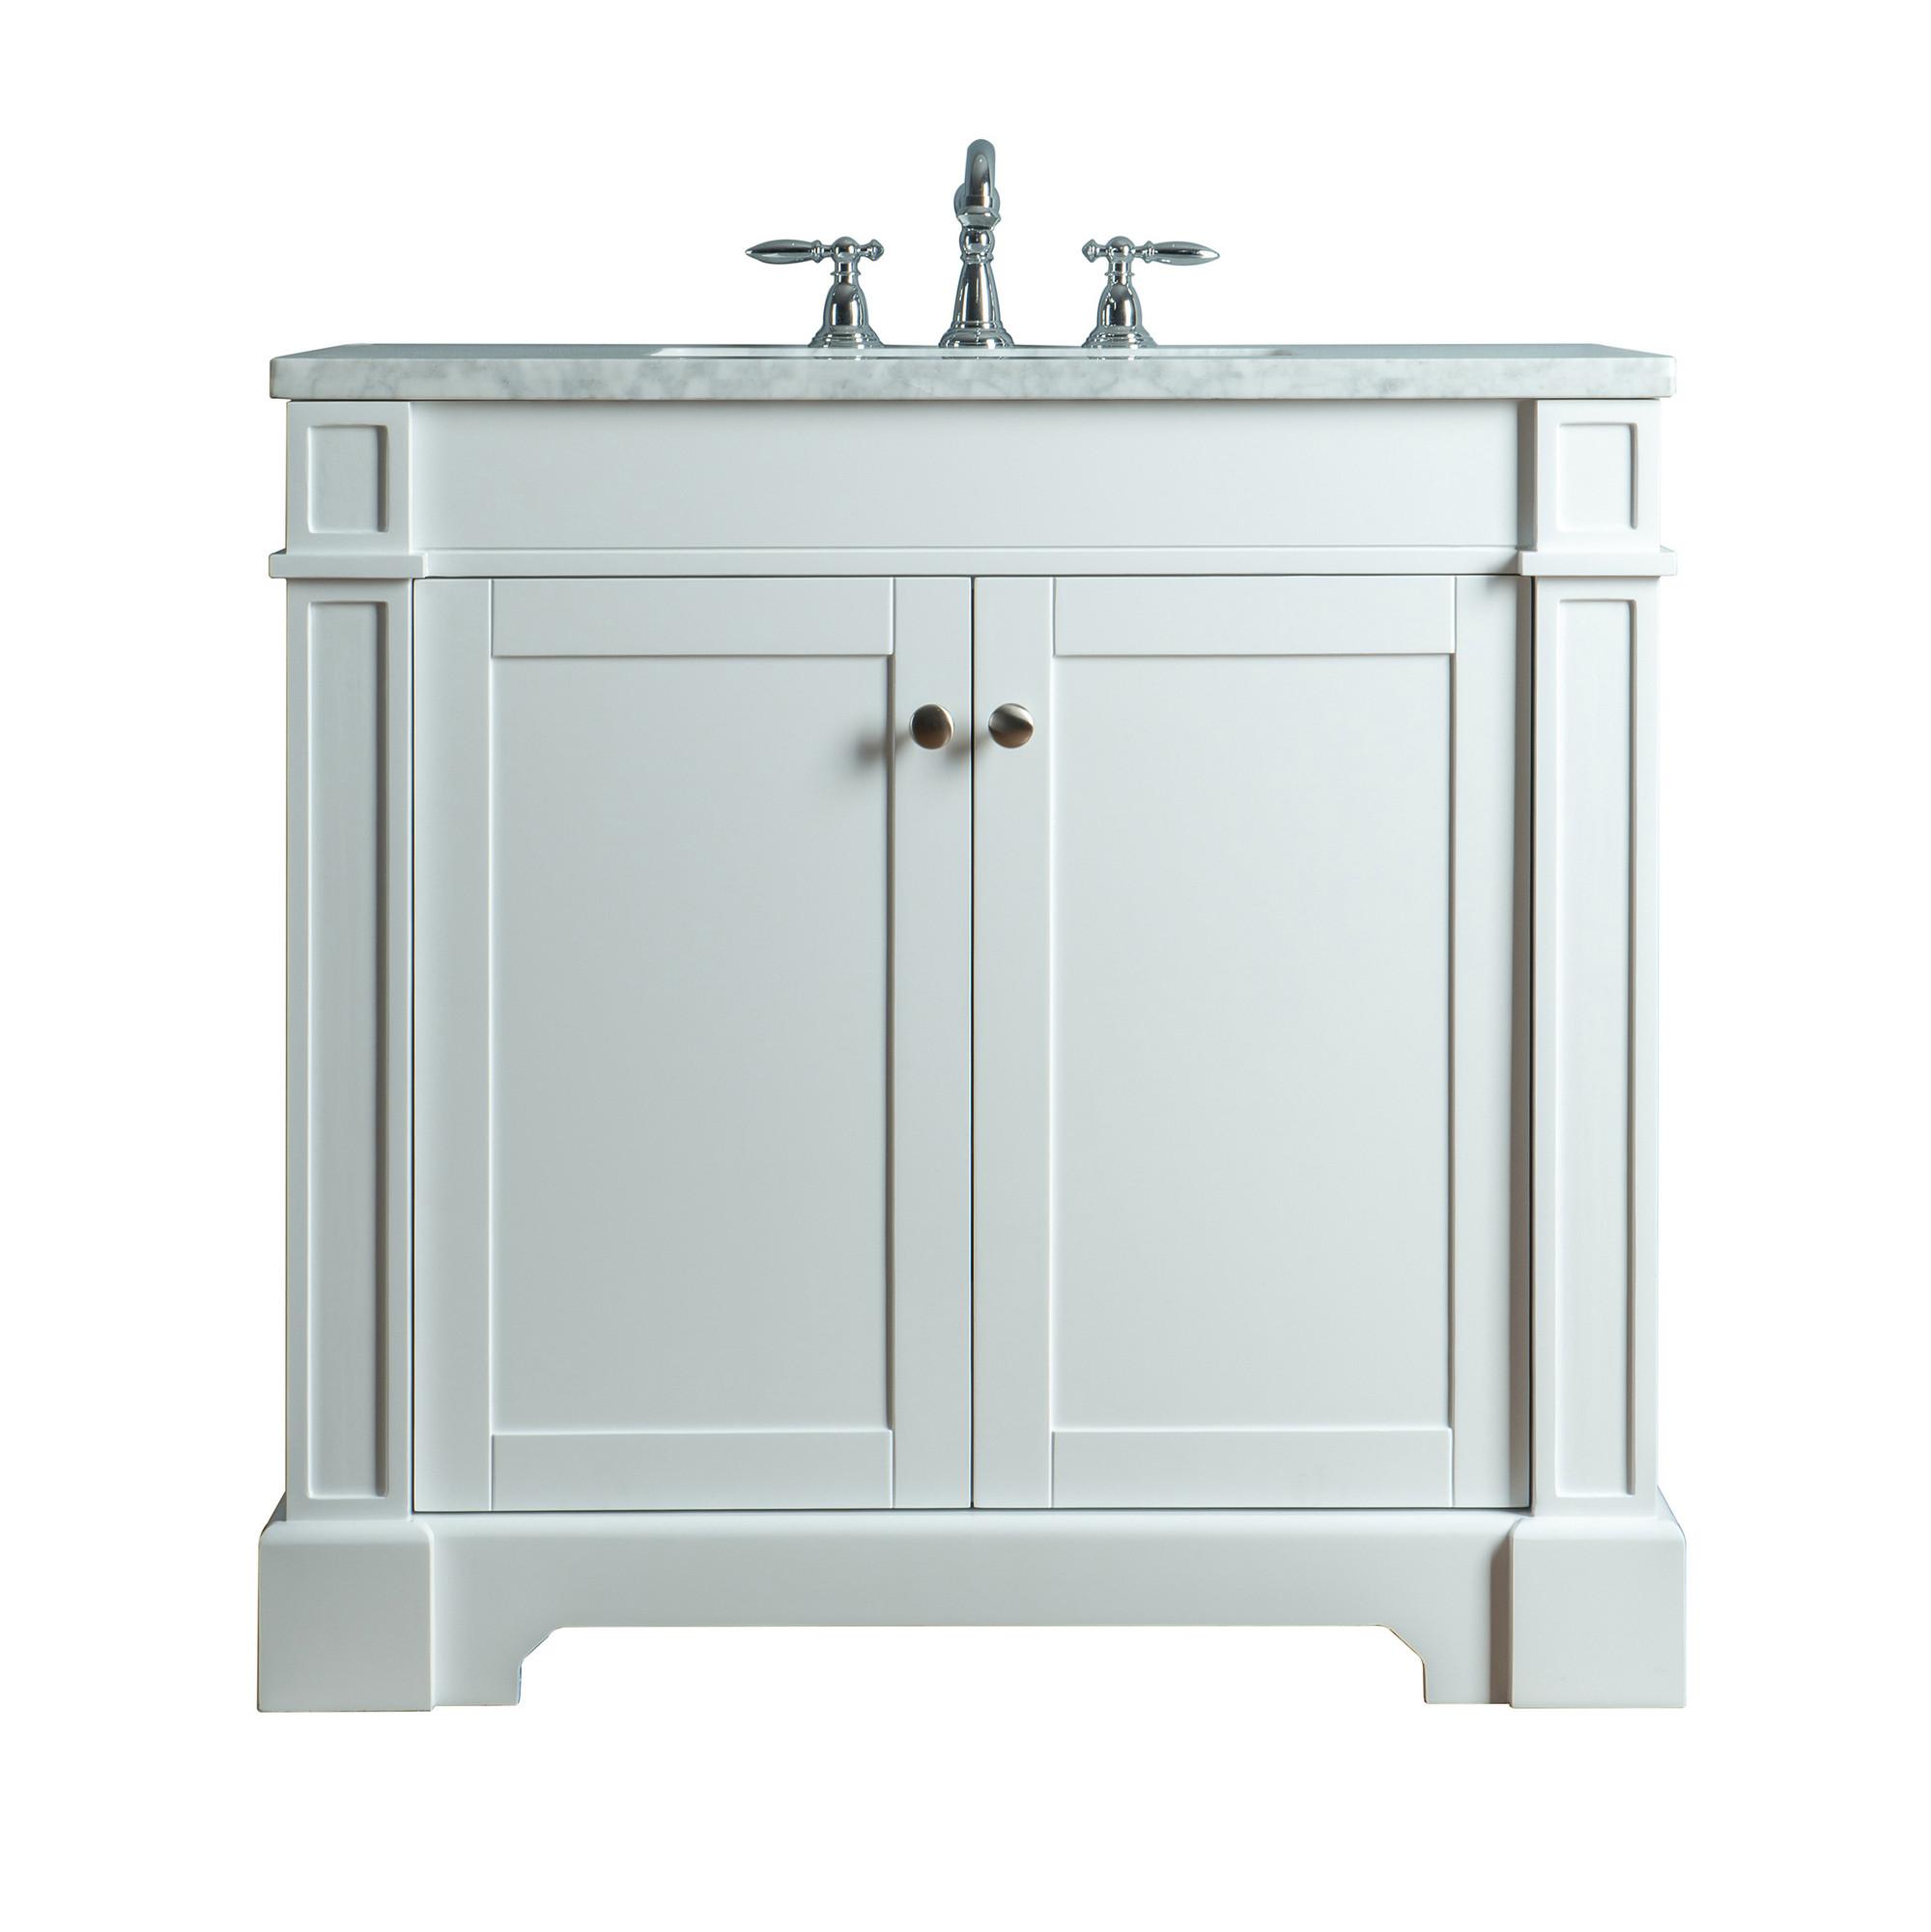 Stufurhome HD-1632W-36-CR White Seine Bathroom Vanity With Carrera Top